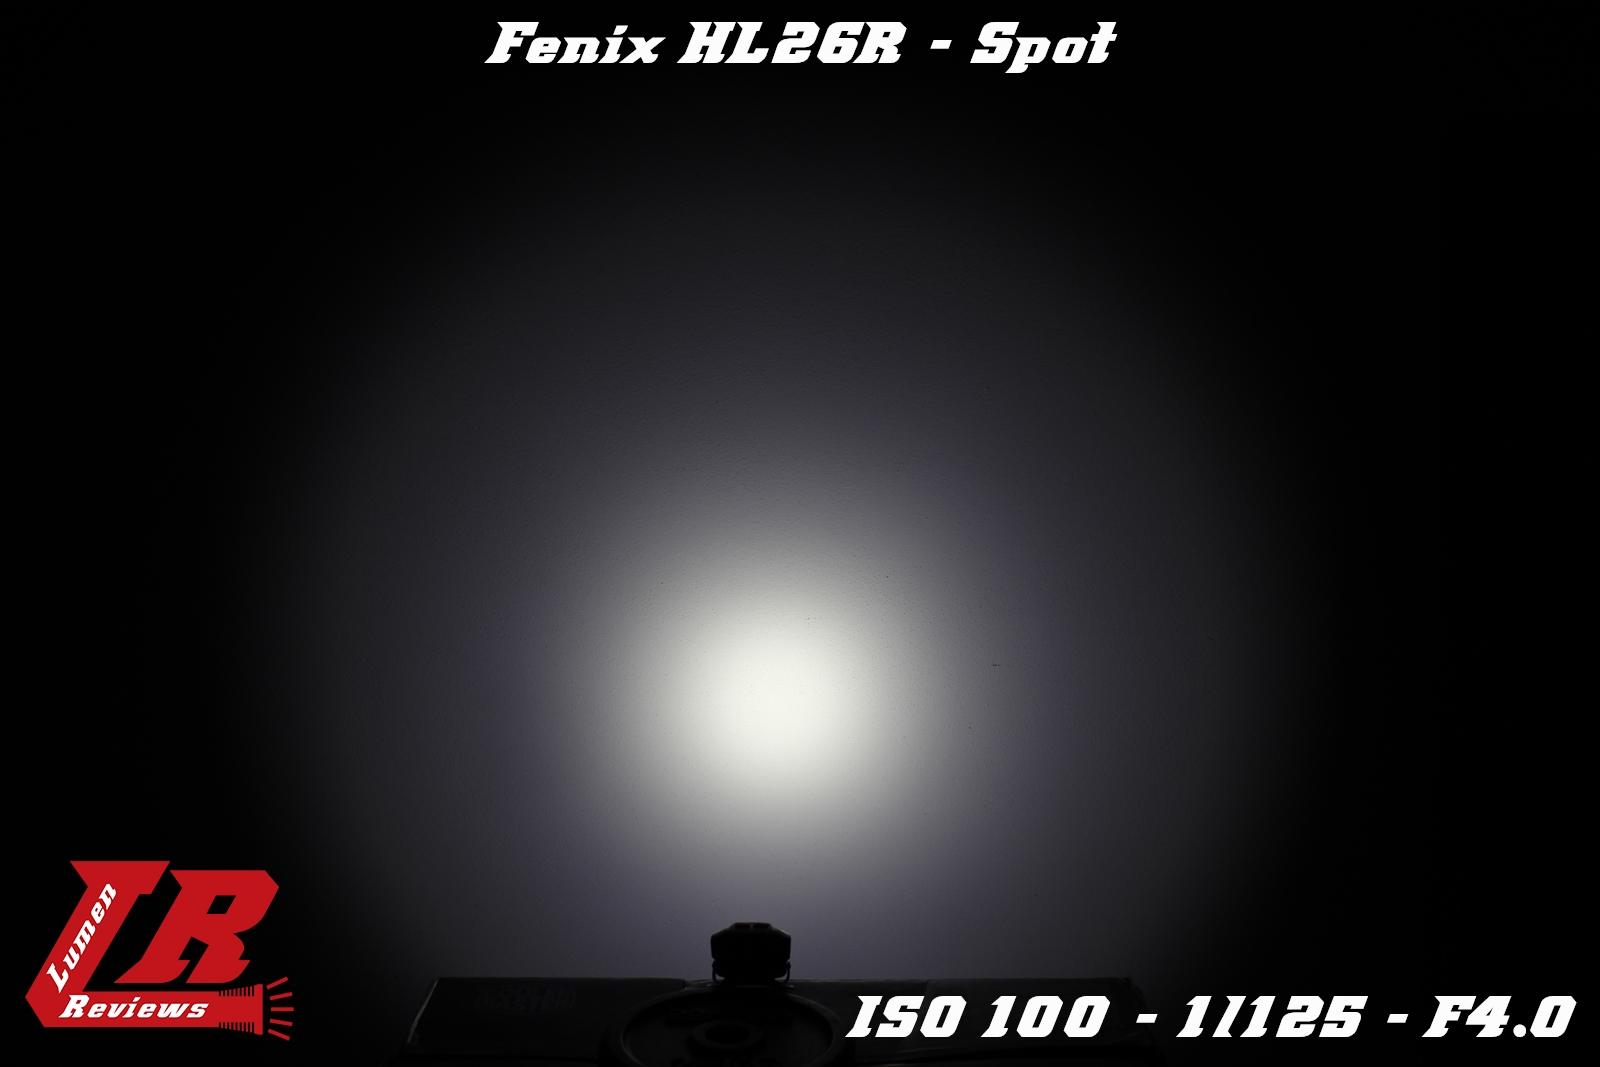 Fenix HL26R 19